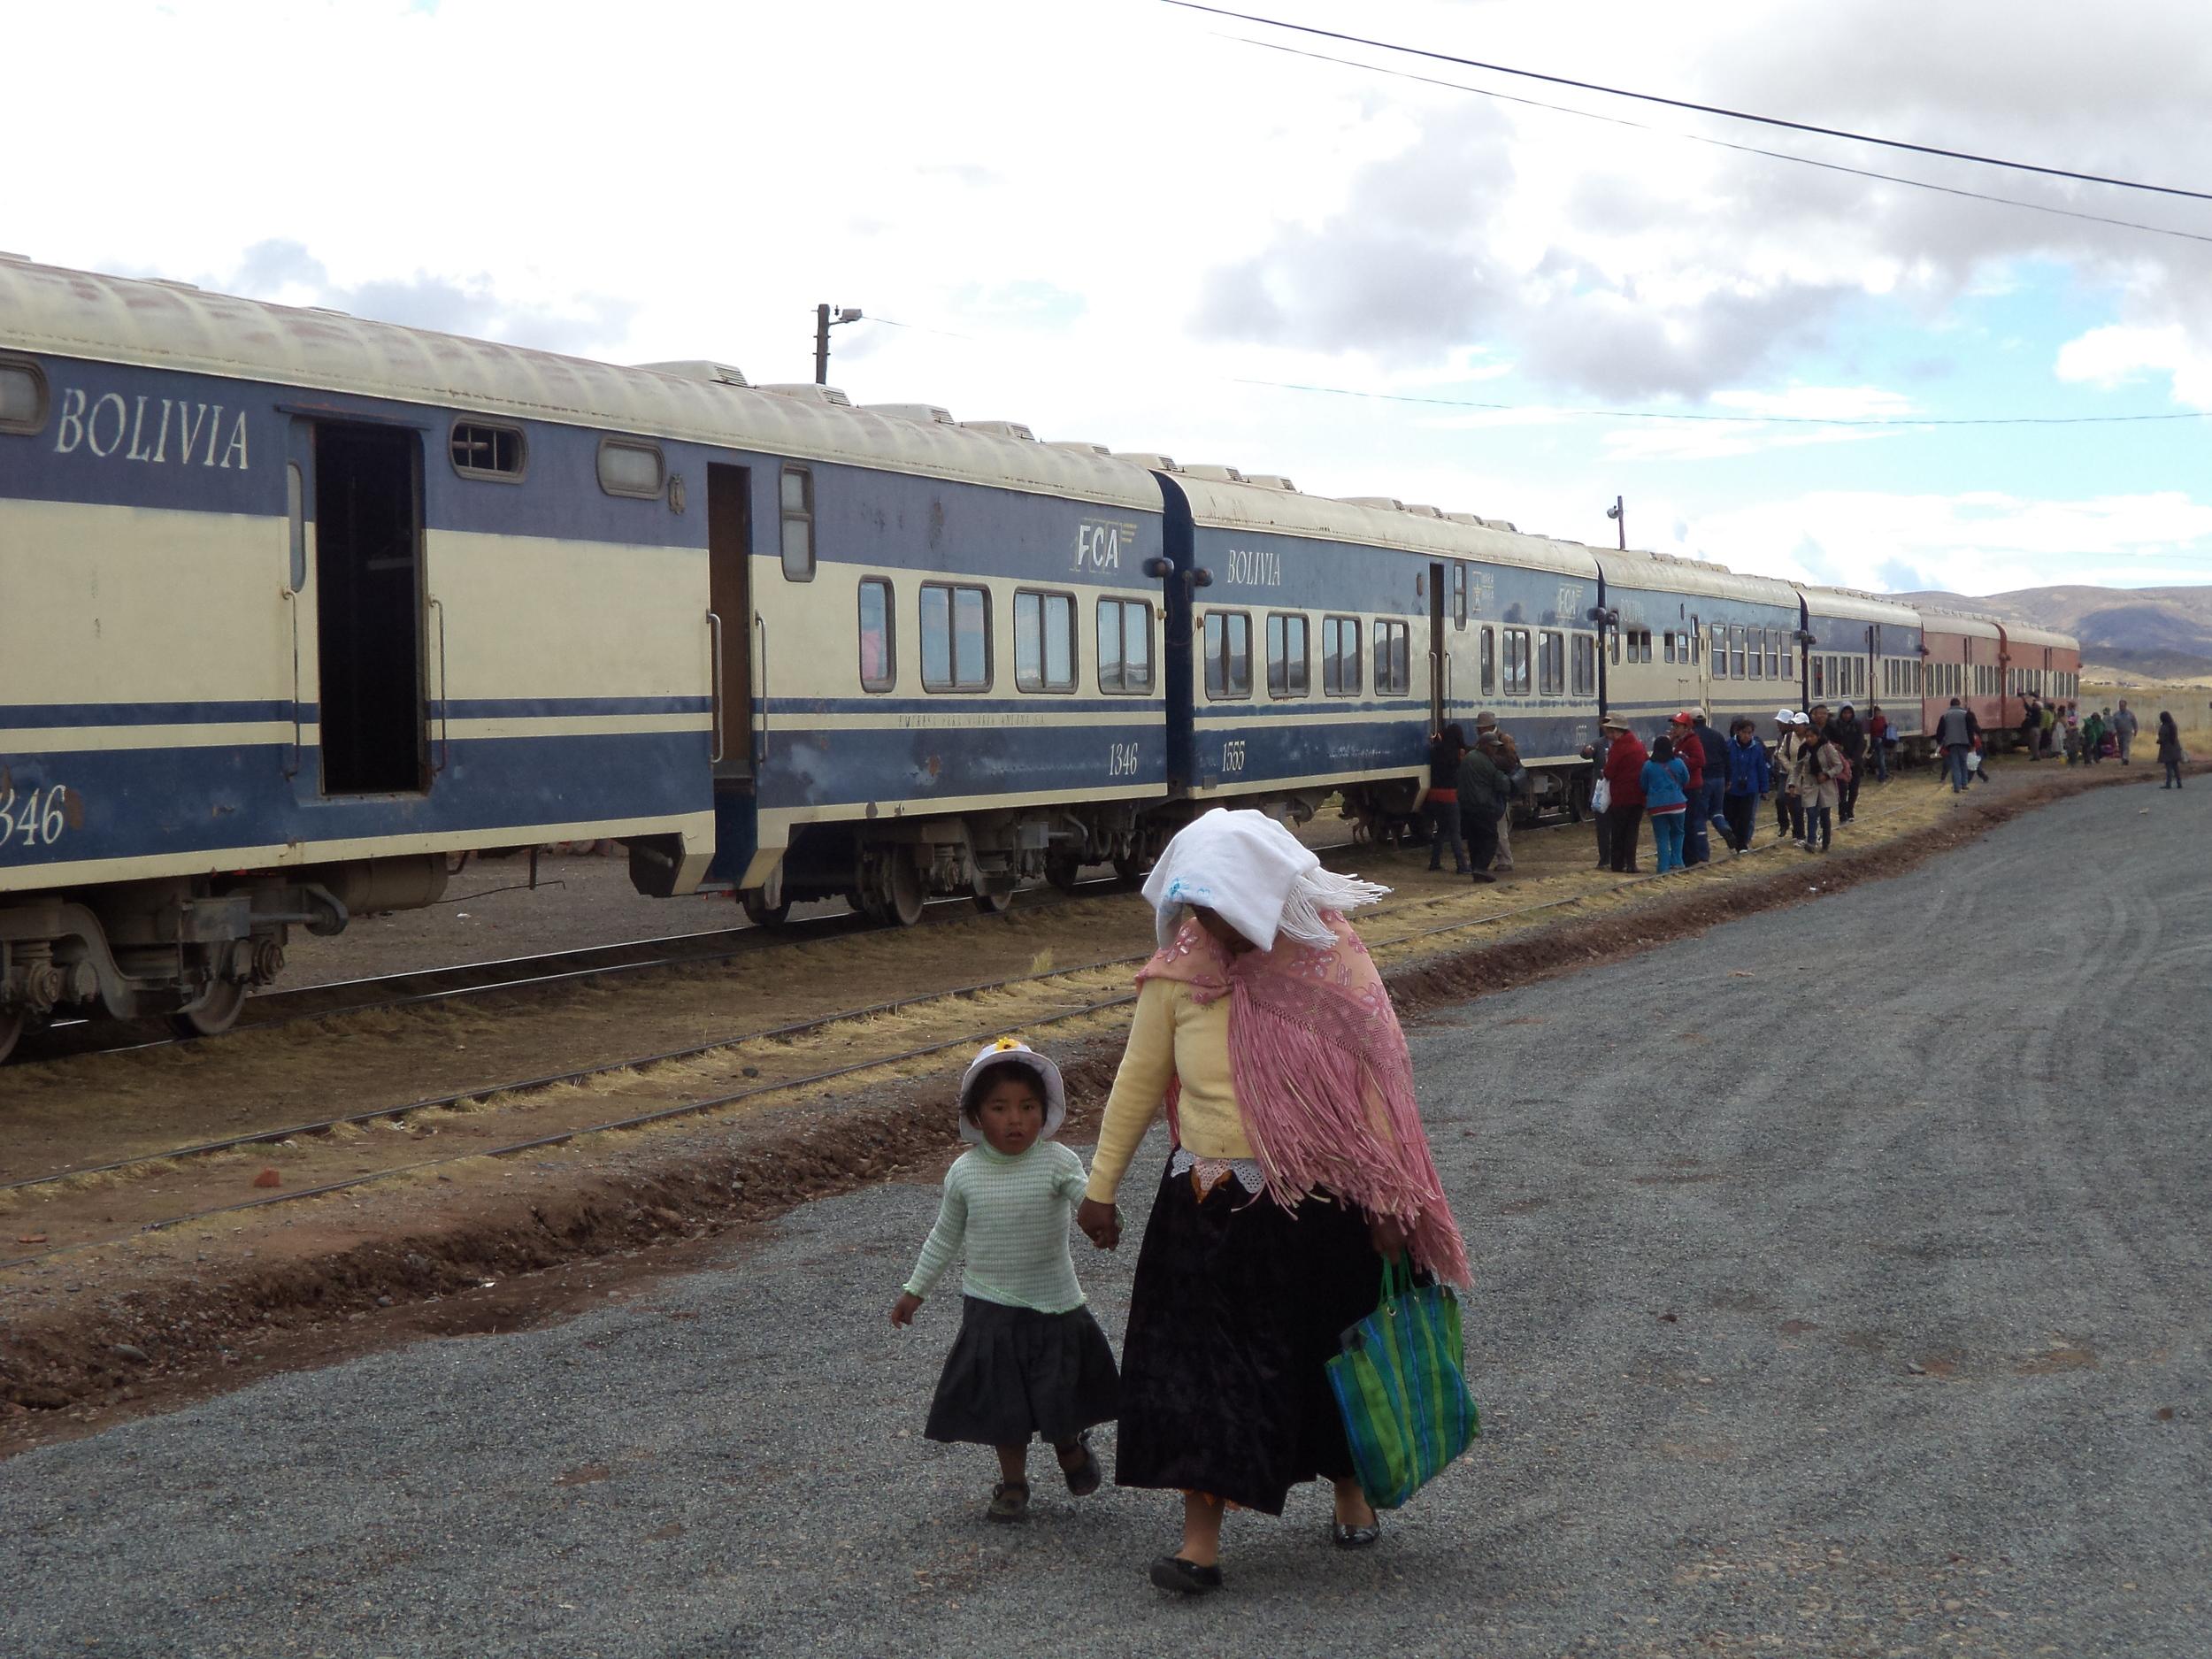 Train arriving small village in Bolivia close to border of Chile